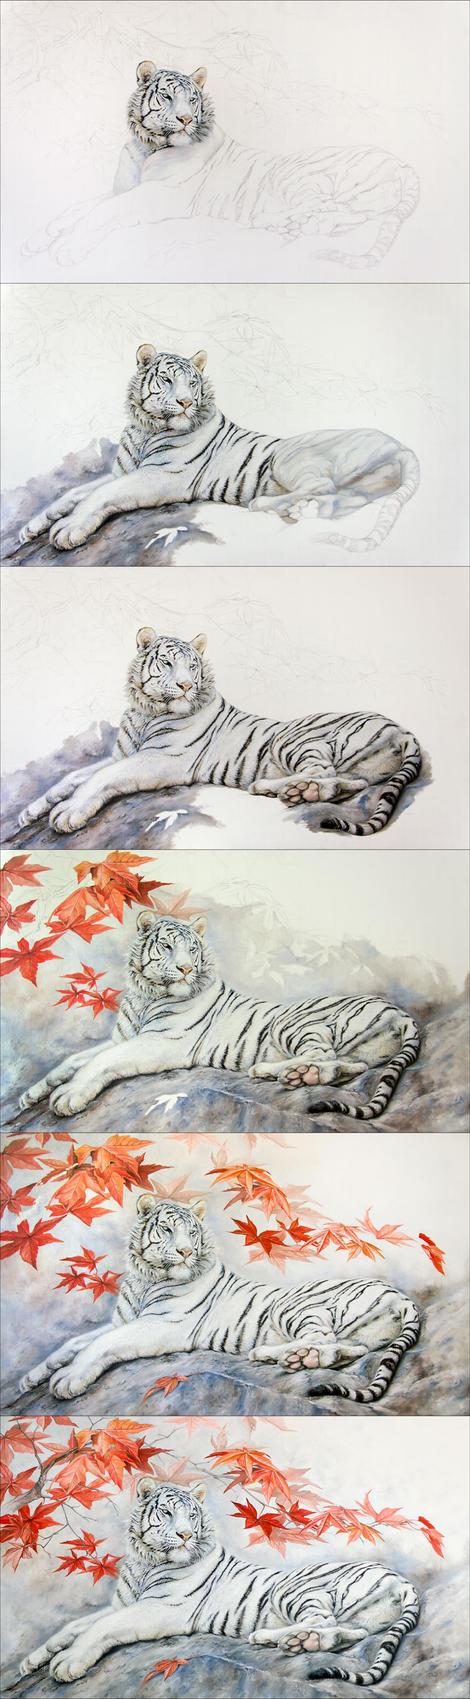 WIP White tigress by IrenaDem